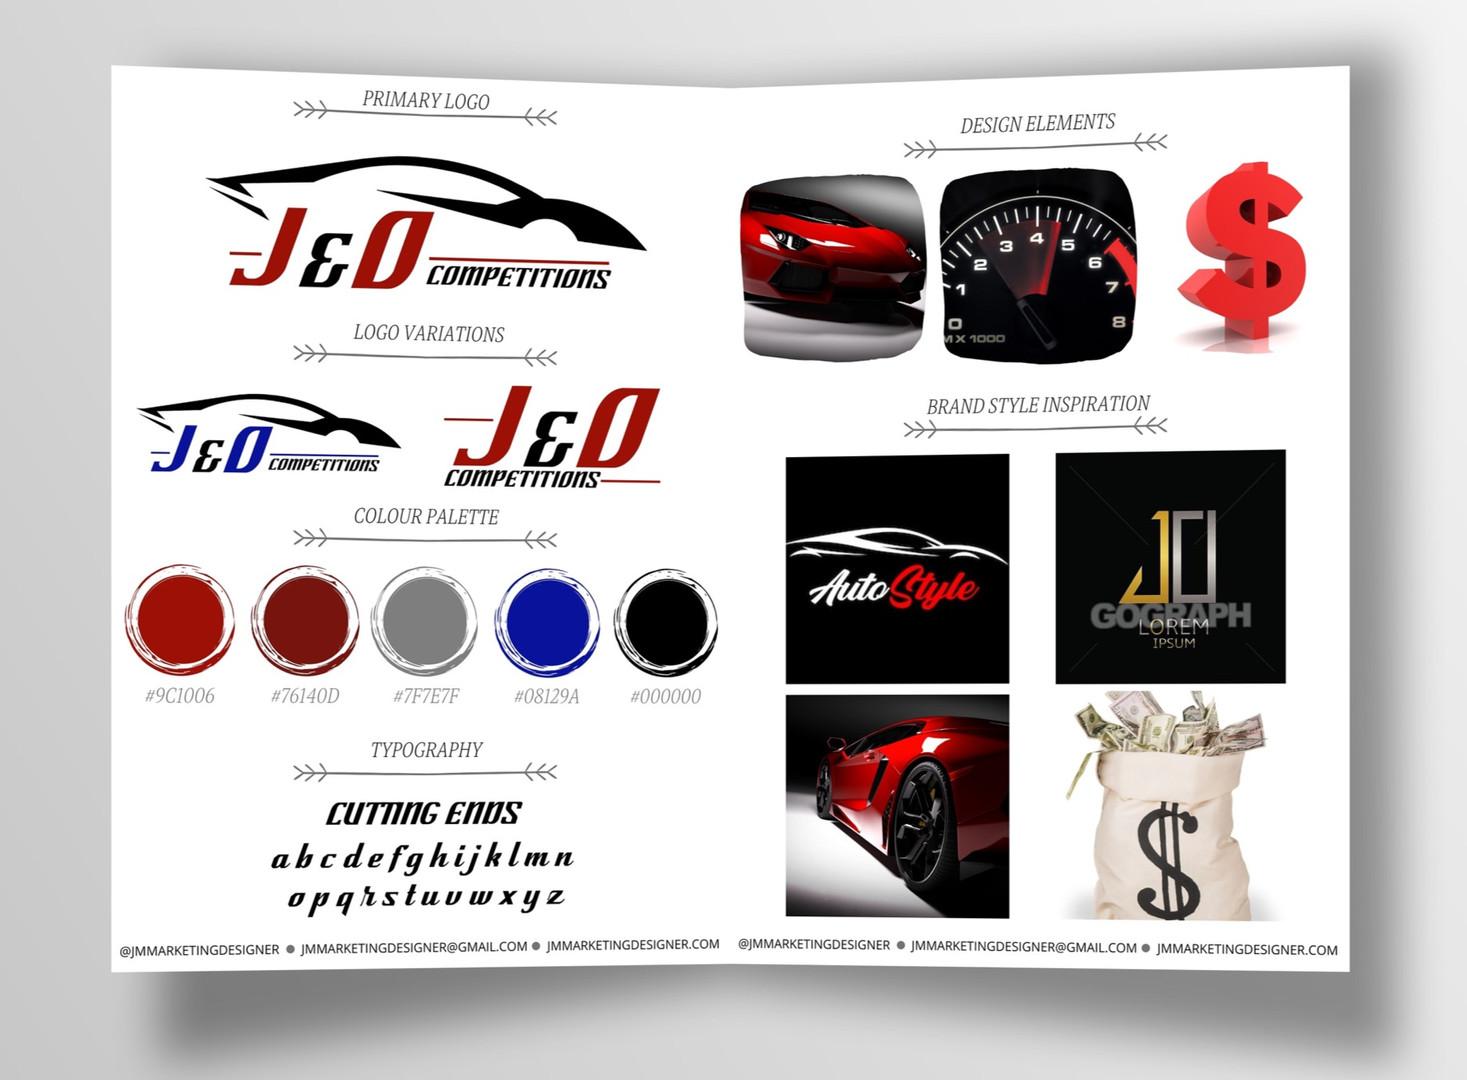 J&O Competitions Branding File Mock Up.j